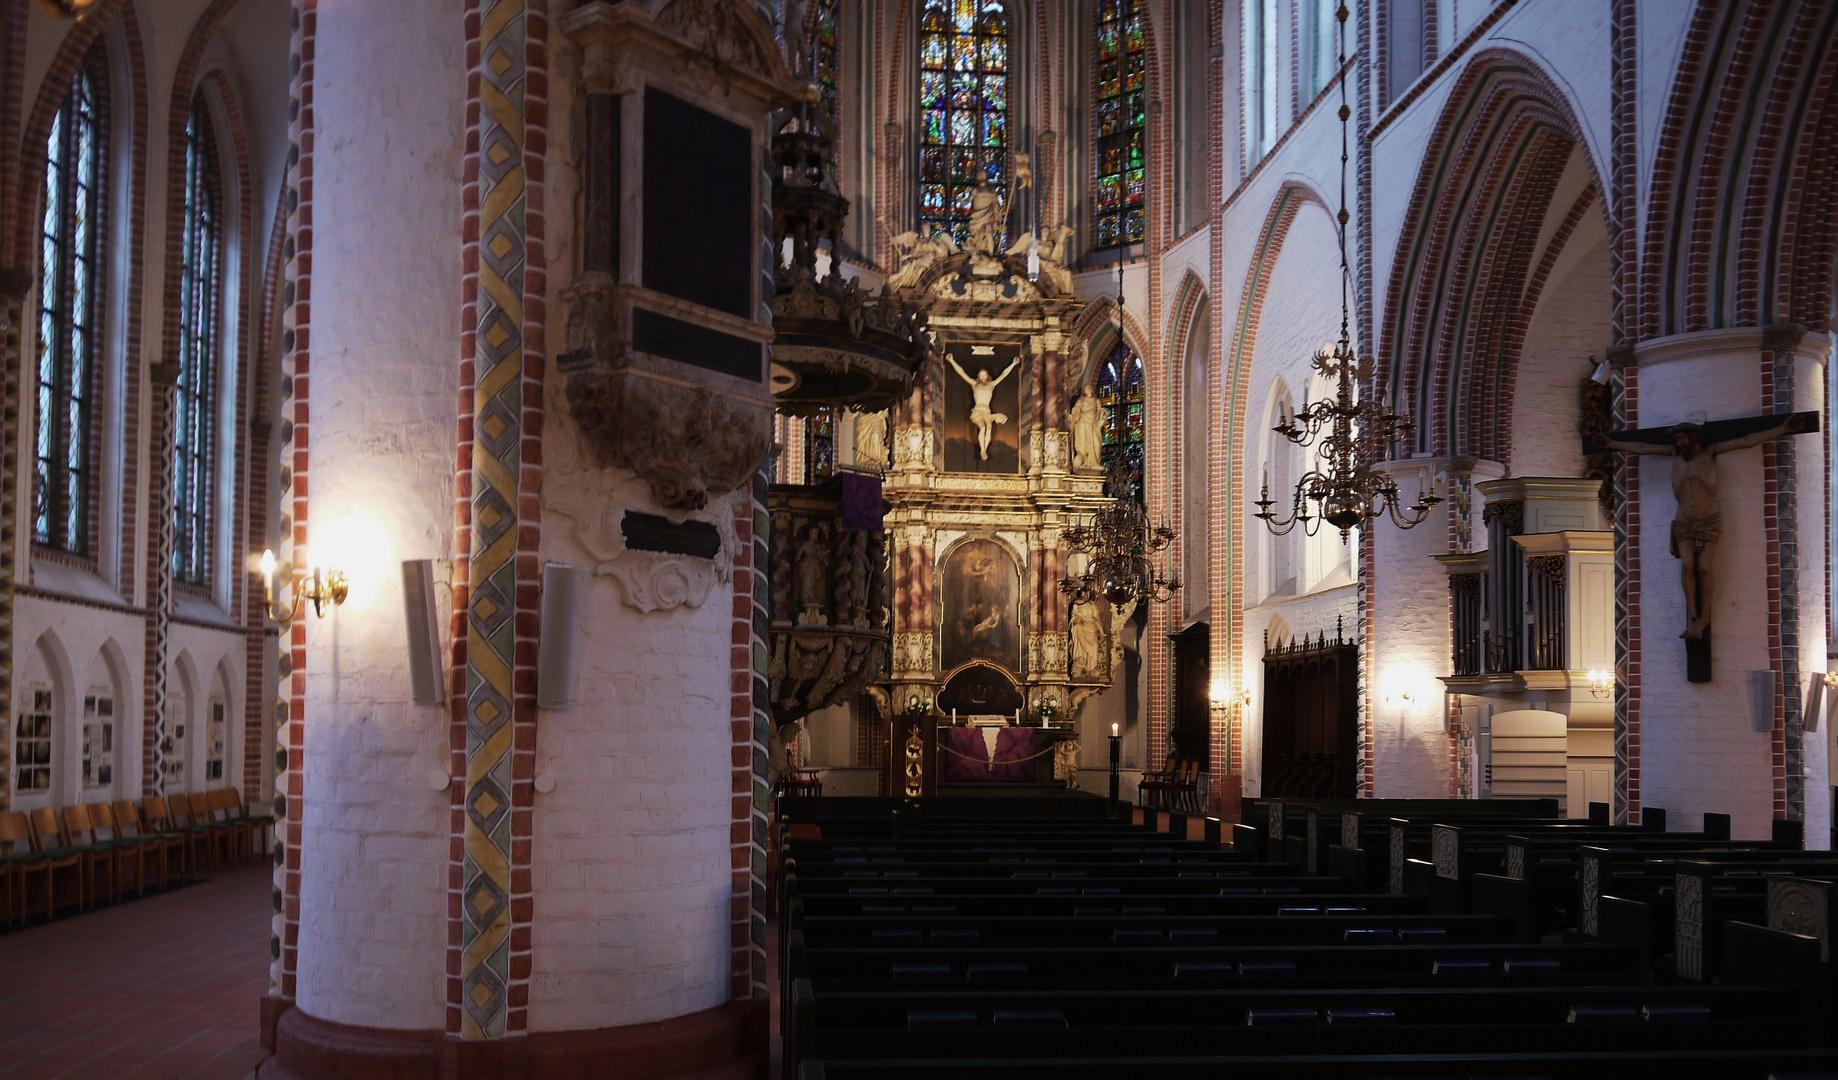 St.-Petri-Kirche in Buxtehude